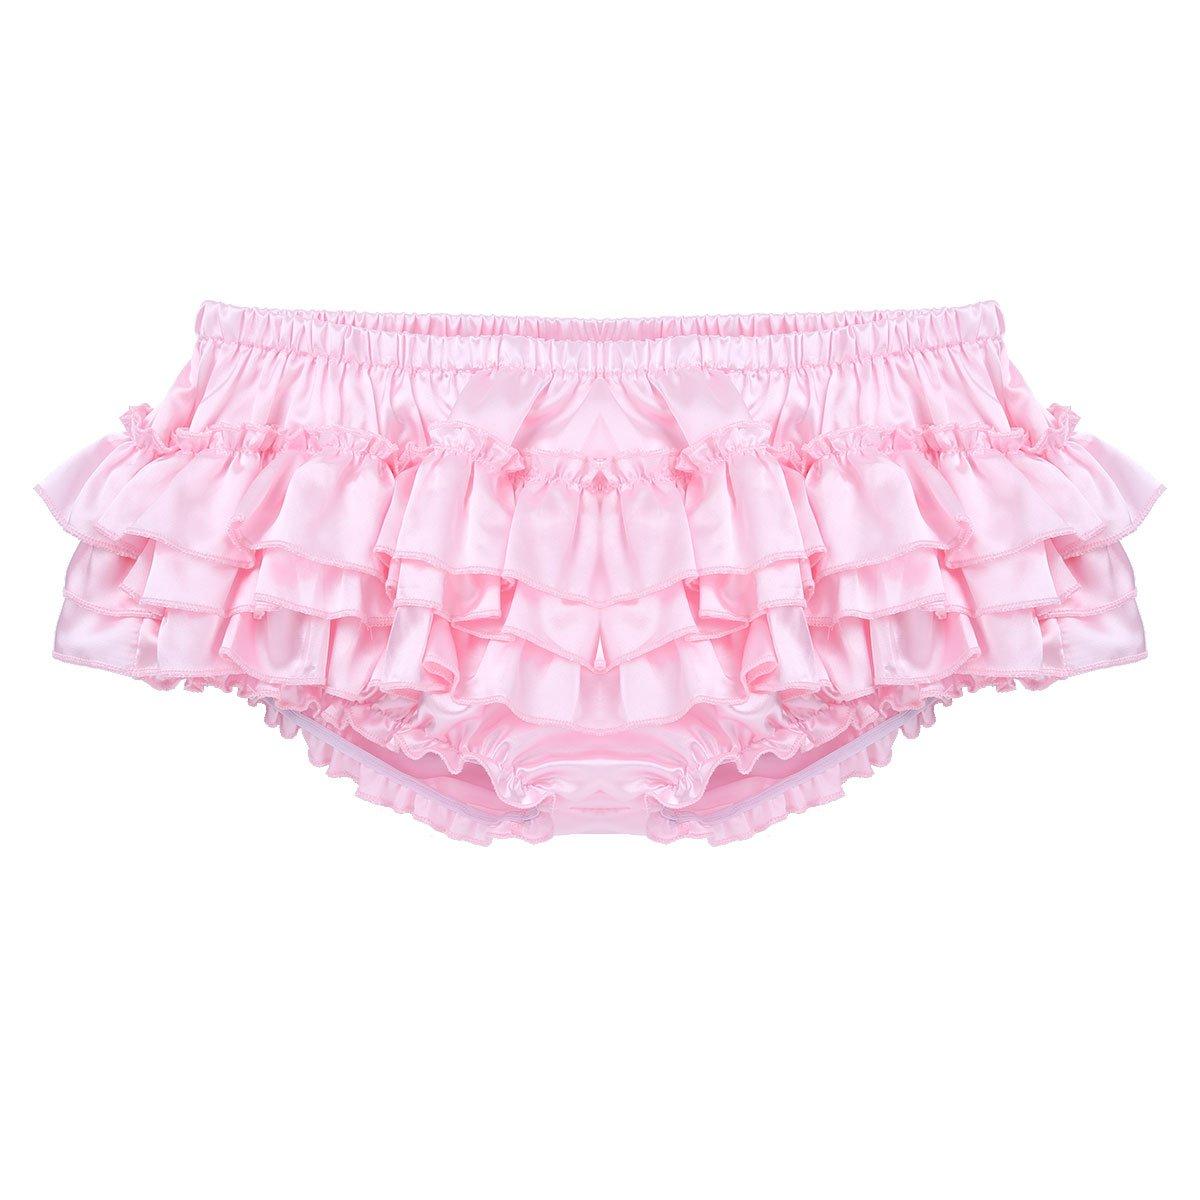 CHICTRY Men's Satin Frilly Thong Sissy Crossdress Bloomer Ruffled Skirted Panties